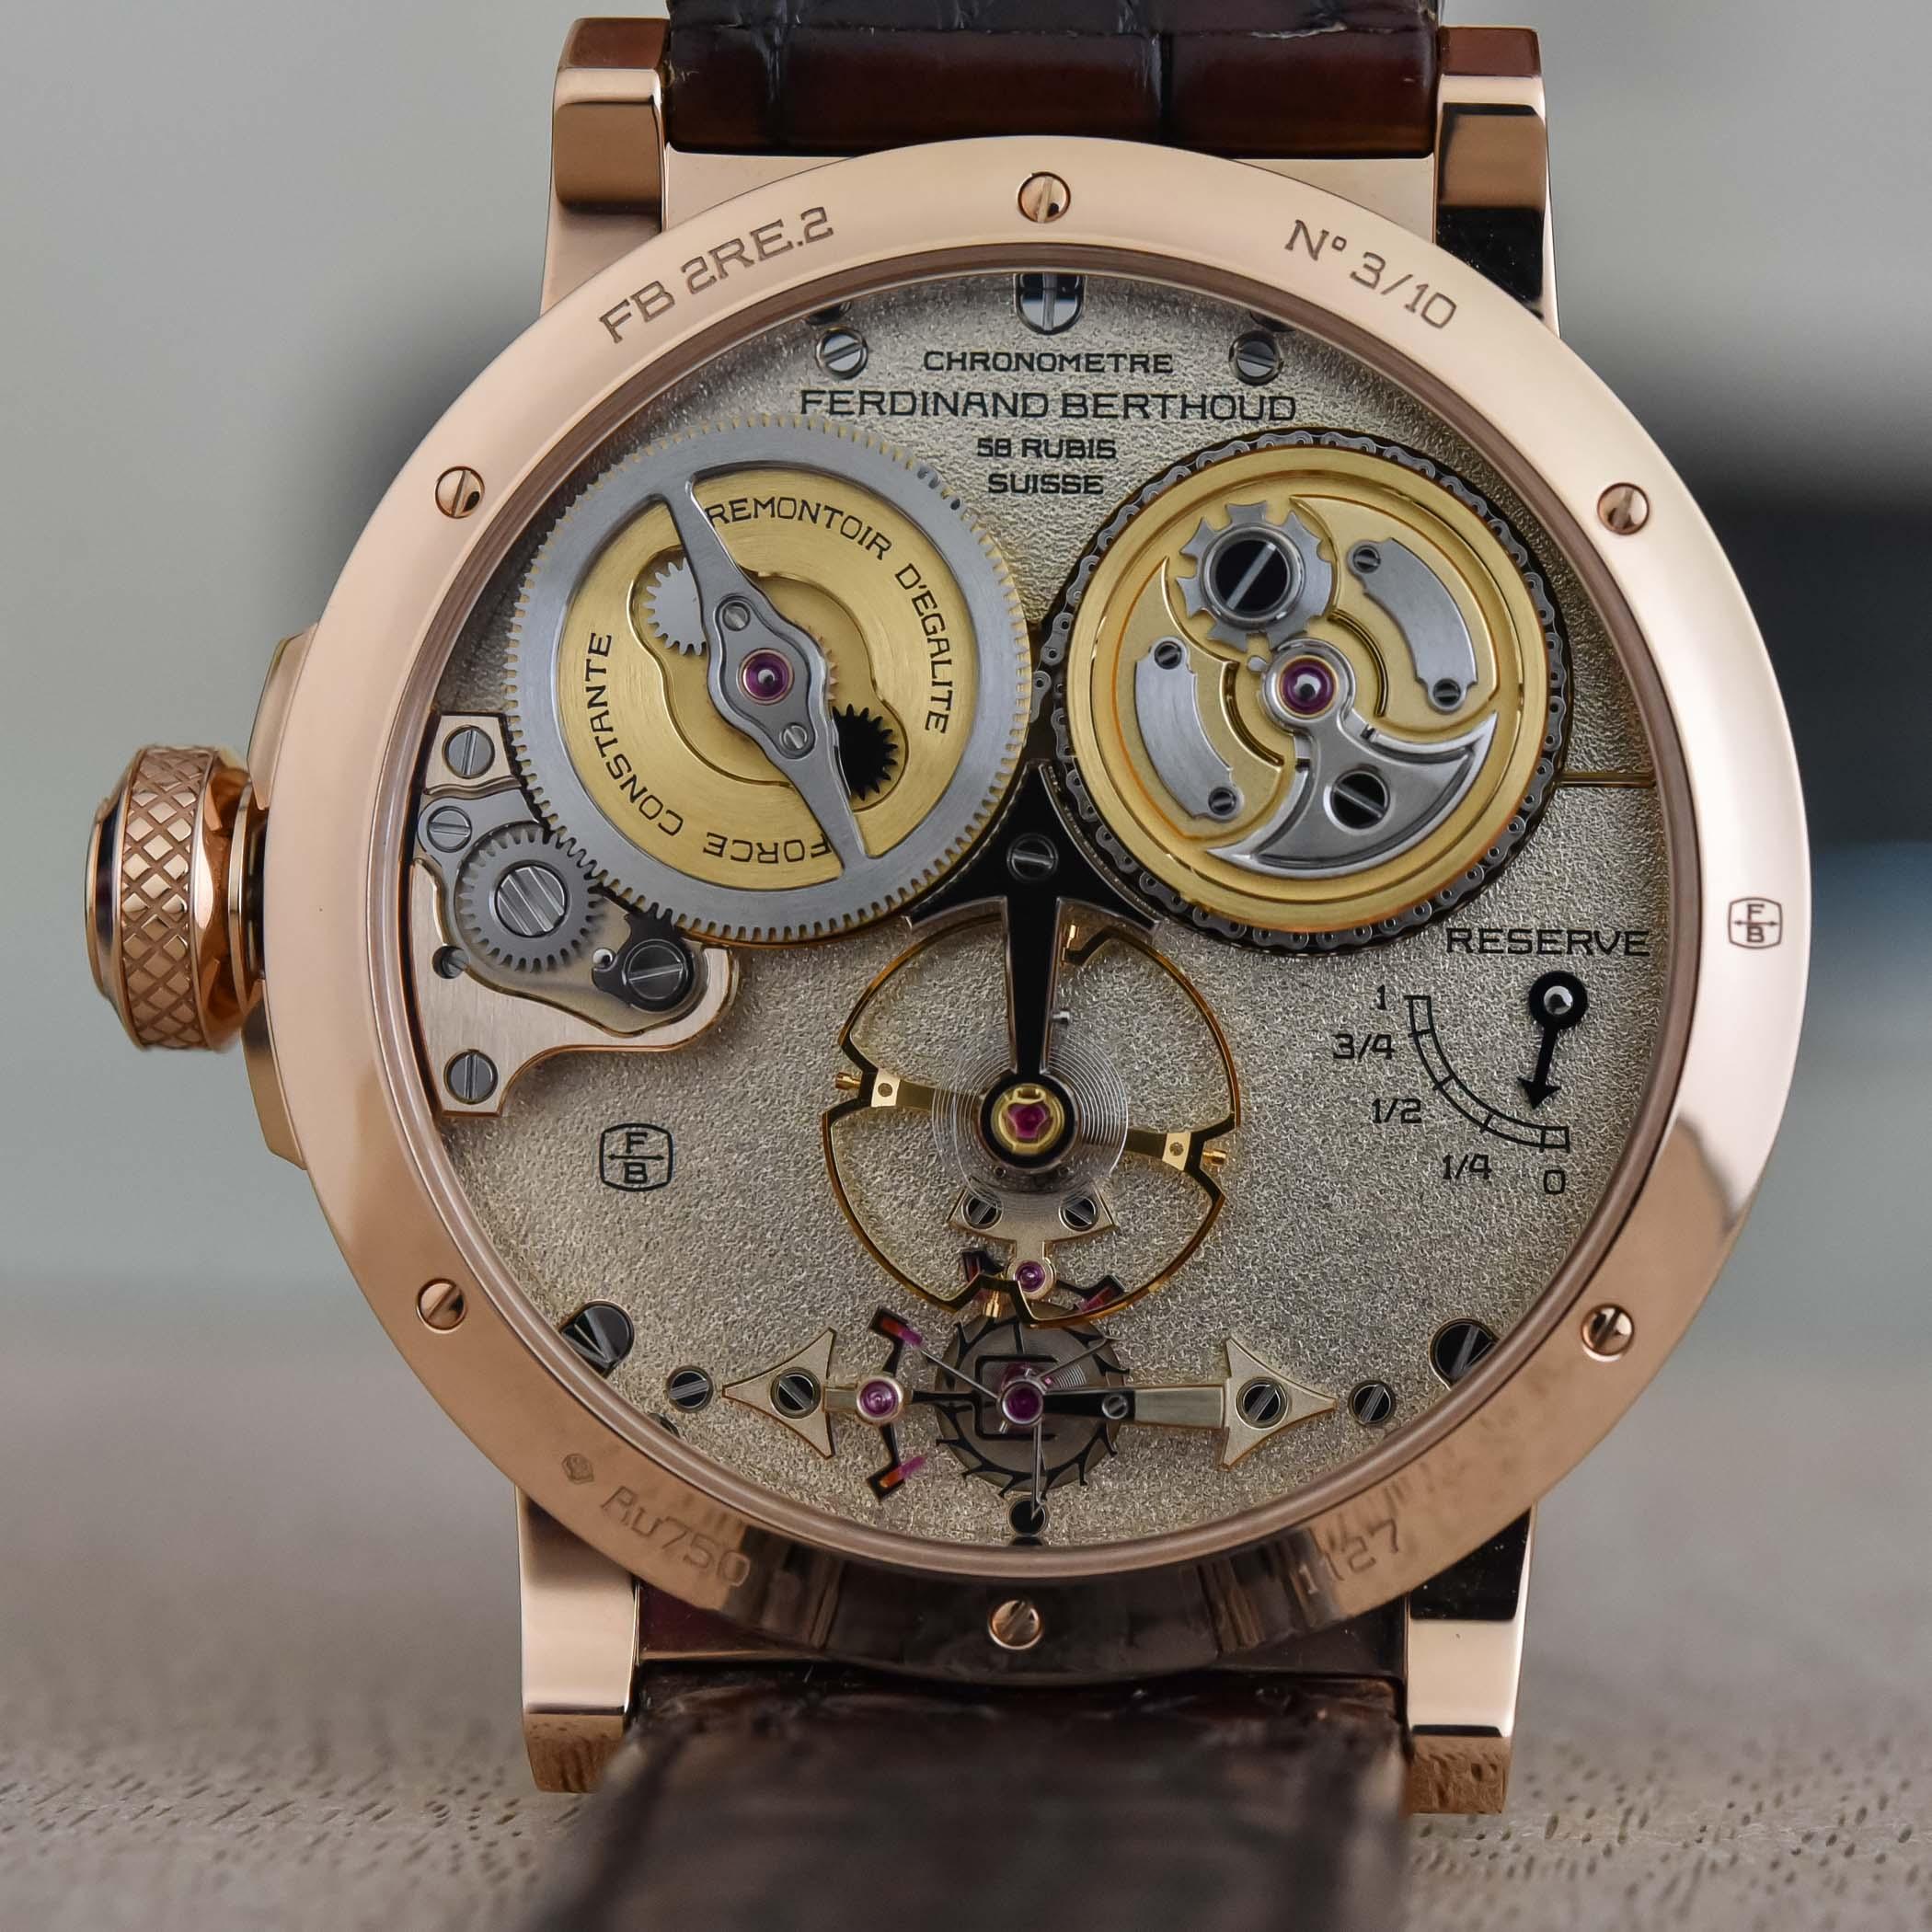 Ferdinand Berthoud Chronometre FB 2RE - 5